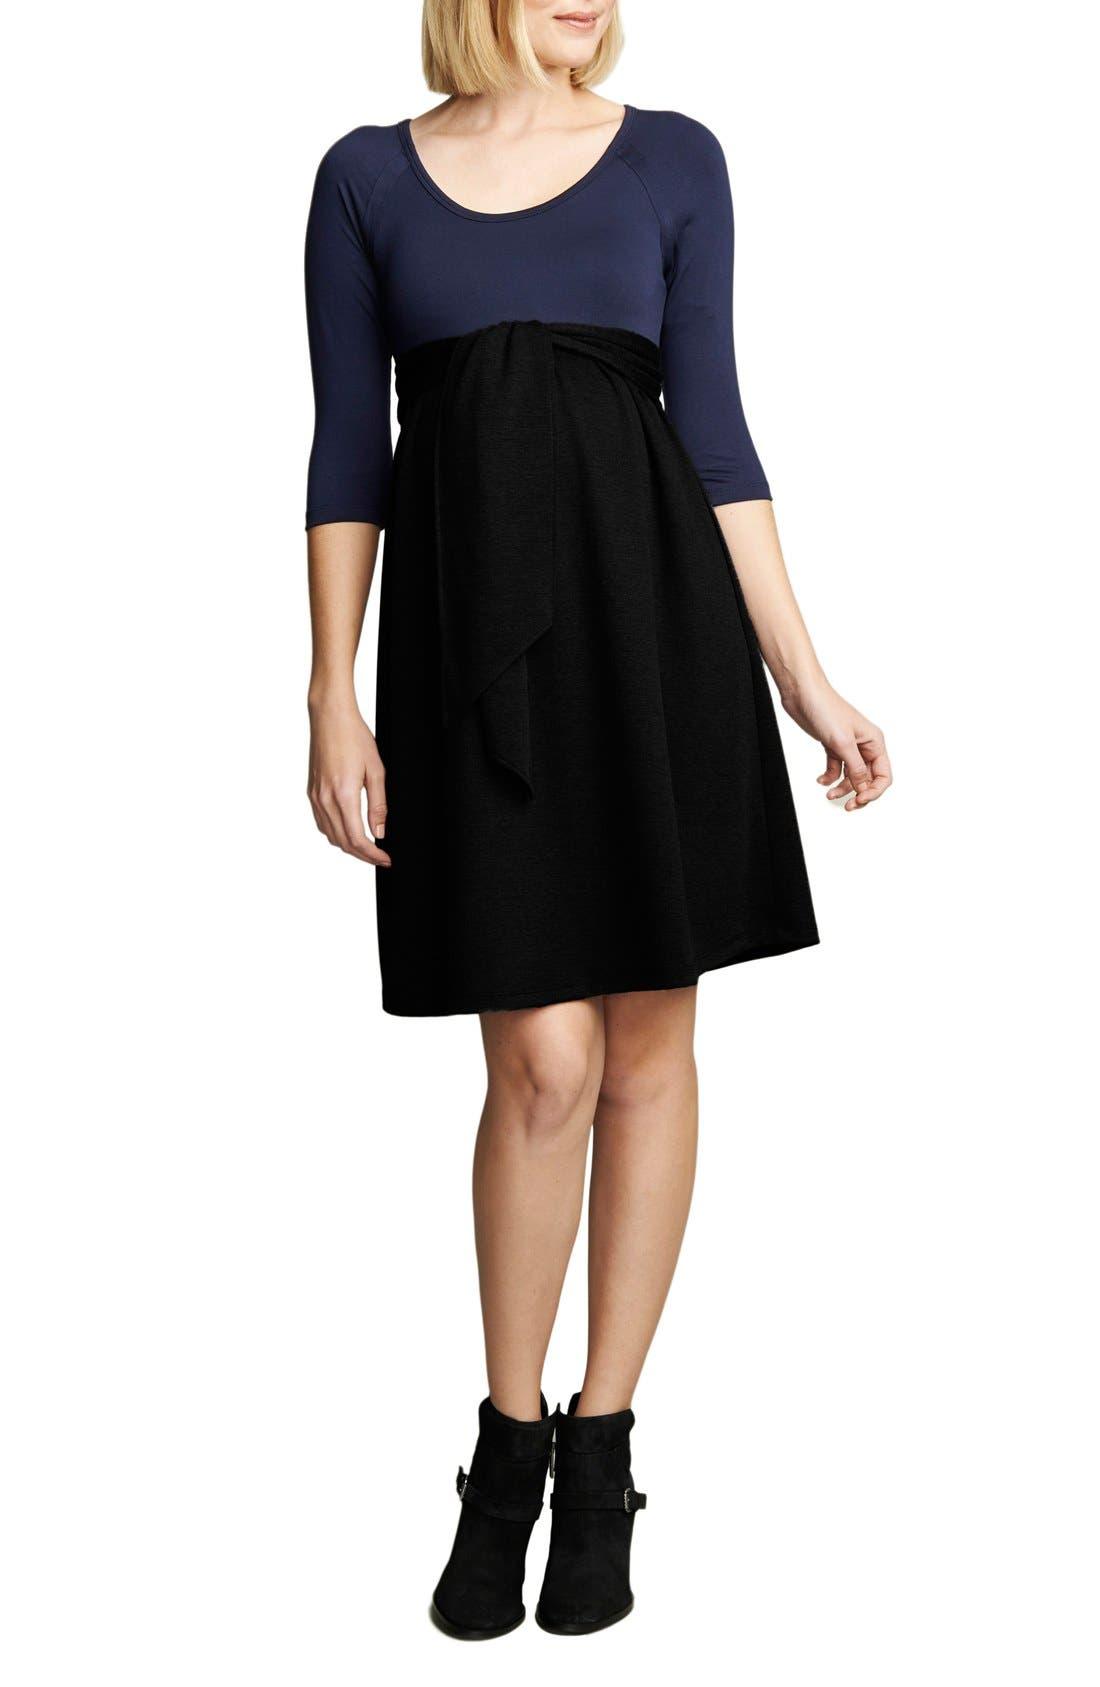 Maternal America Tie Front Maternity Dress, Black